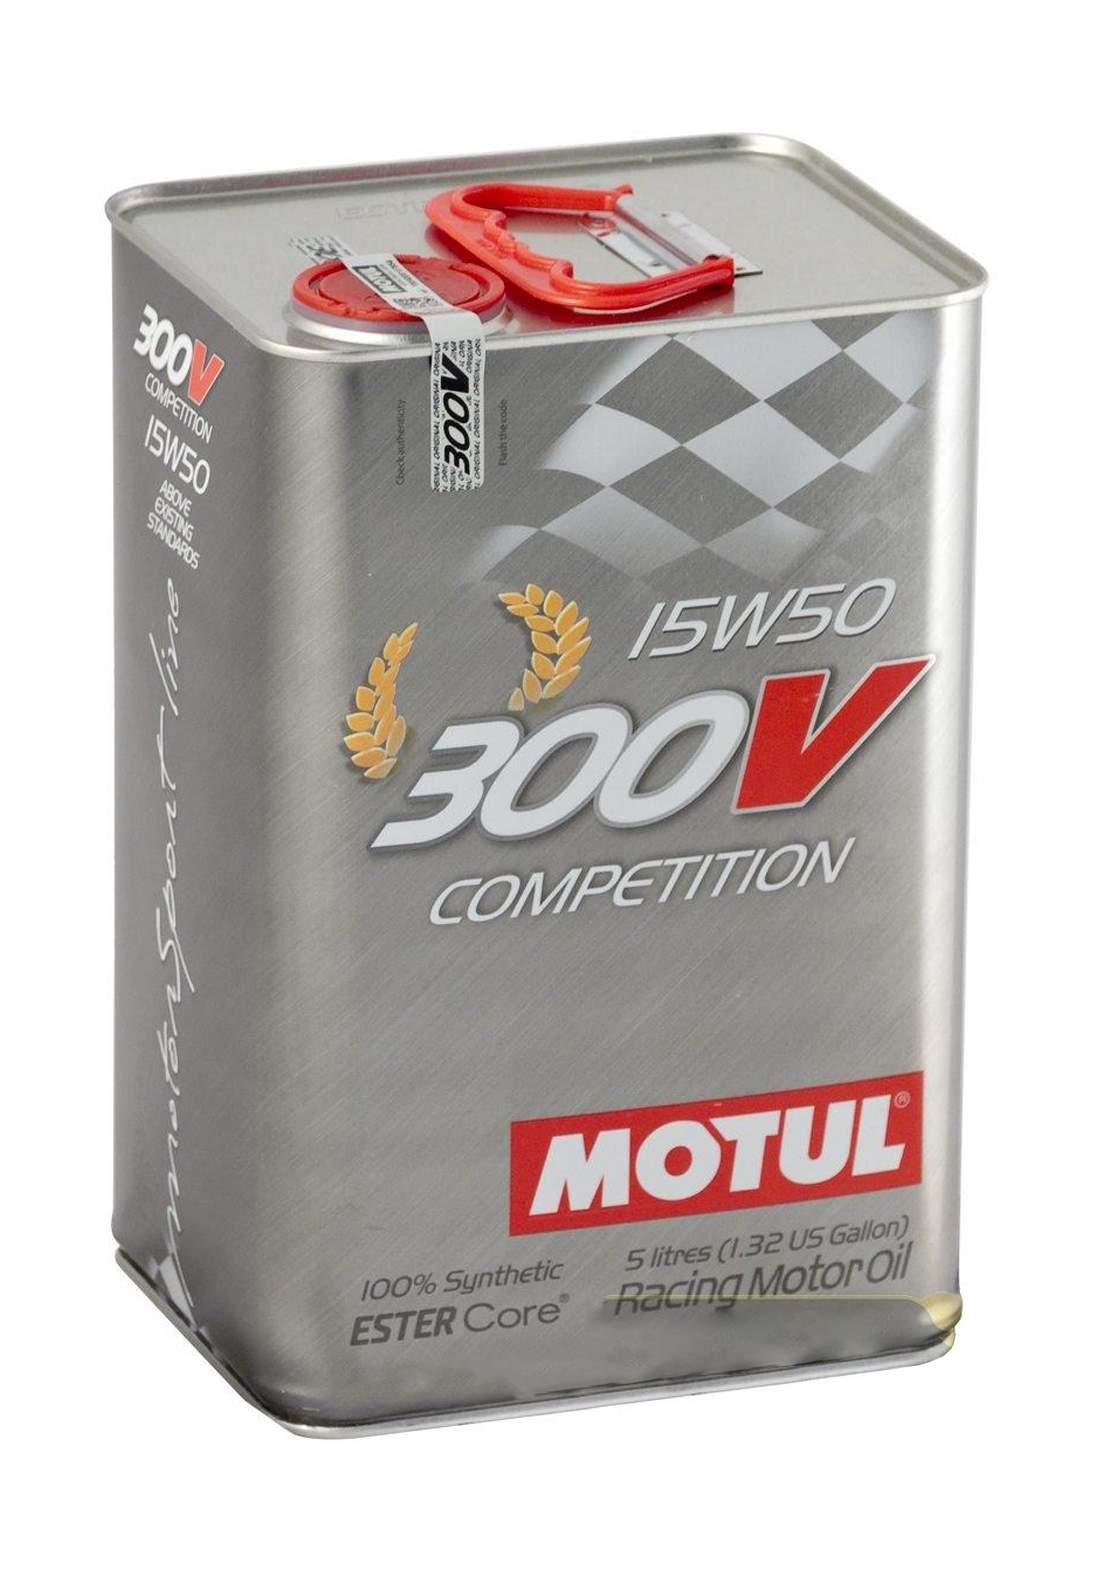 Motul 300v 15w50  Ester Core Oil Launched  2 L زيت محرك السيارة والدراجة